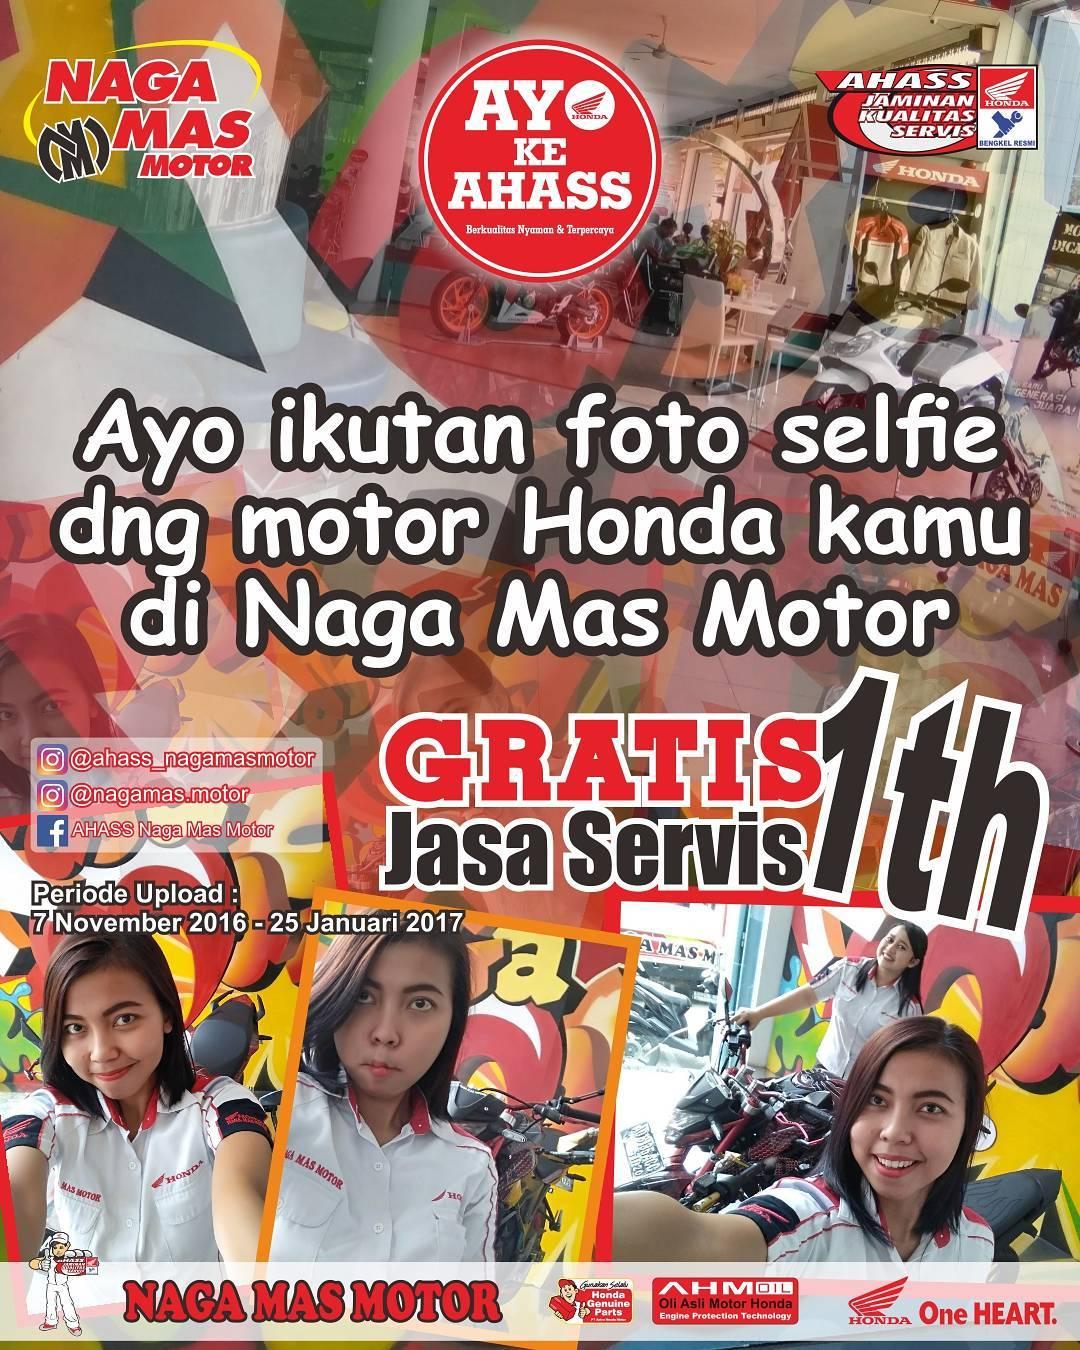 Anisa Counter Sales Dealer Nagamas Motor Klaten All New Beat Sporty Esp Cbs Funk Red Black Kudus Foto Selfie Honda Gratis Jasa Servis Promo Ahass